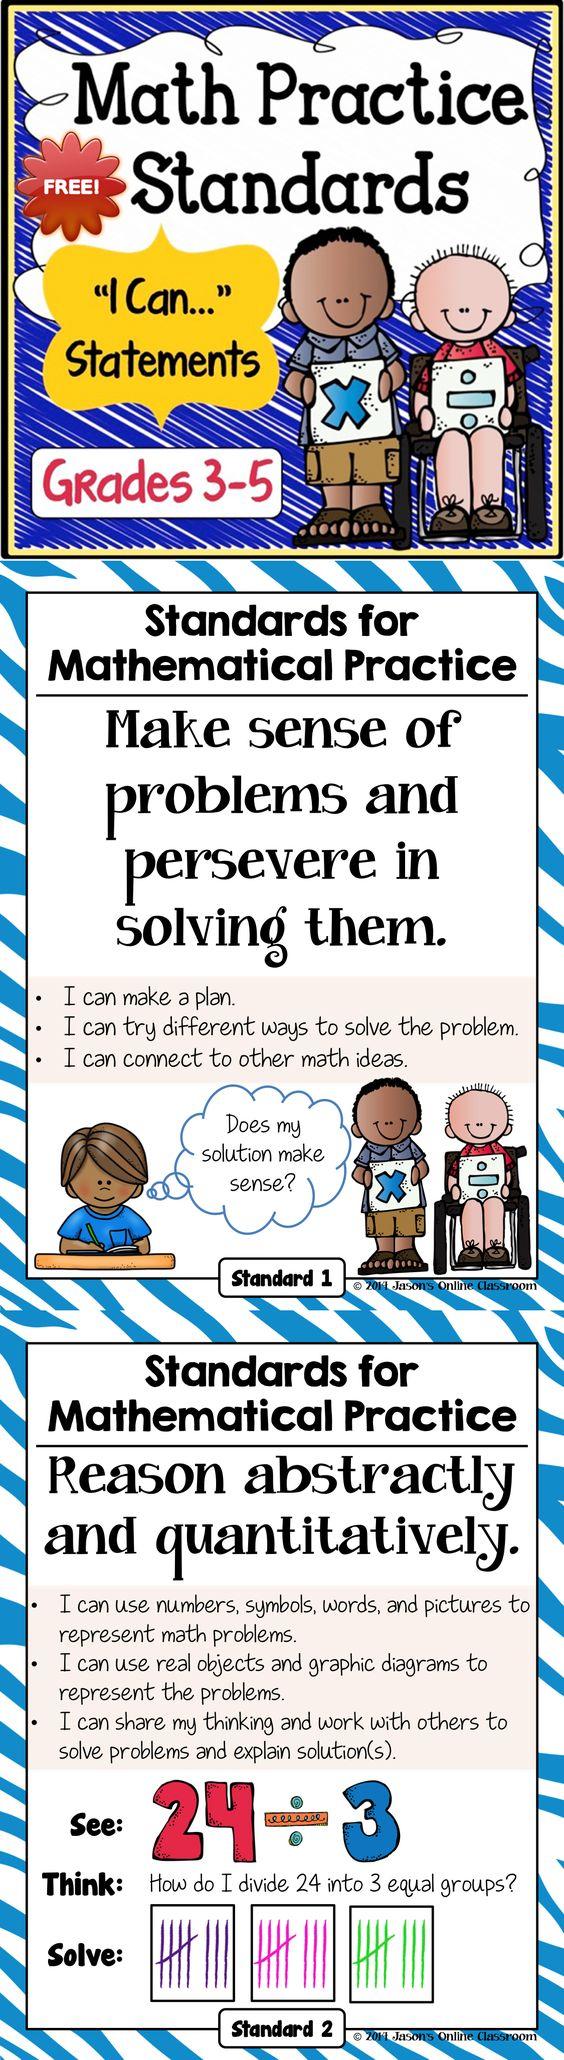 FREEBIE - Math Practice Standards for Grades 3-5